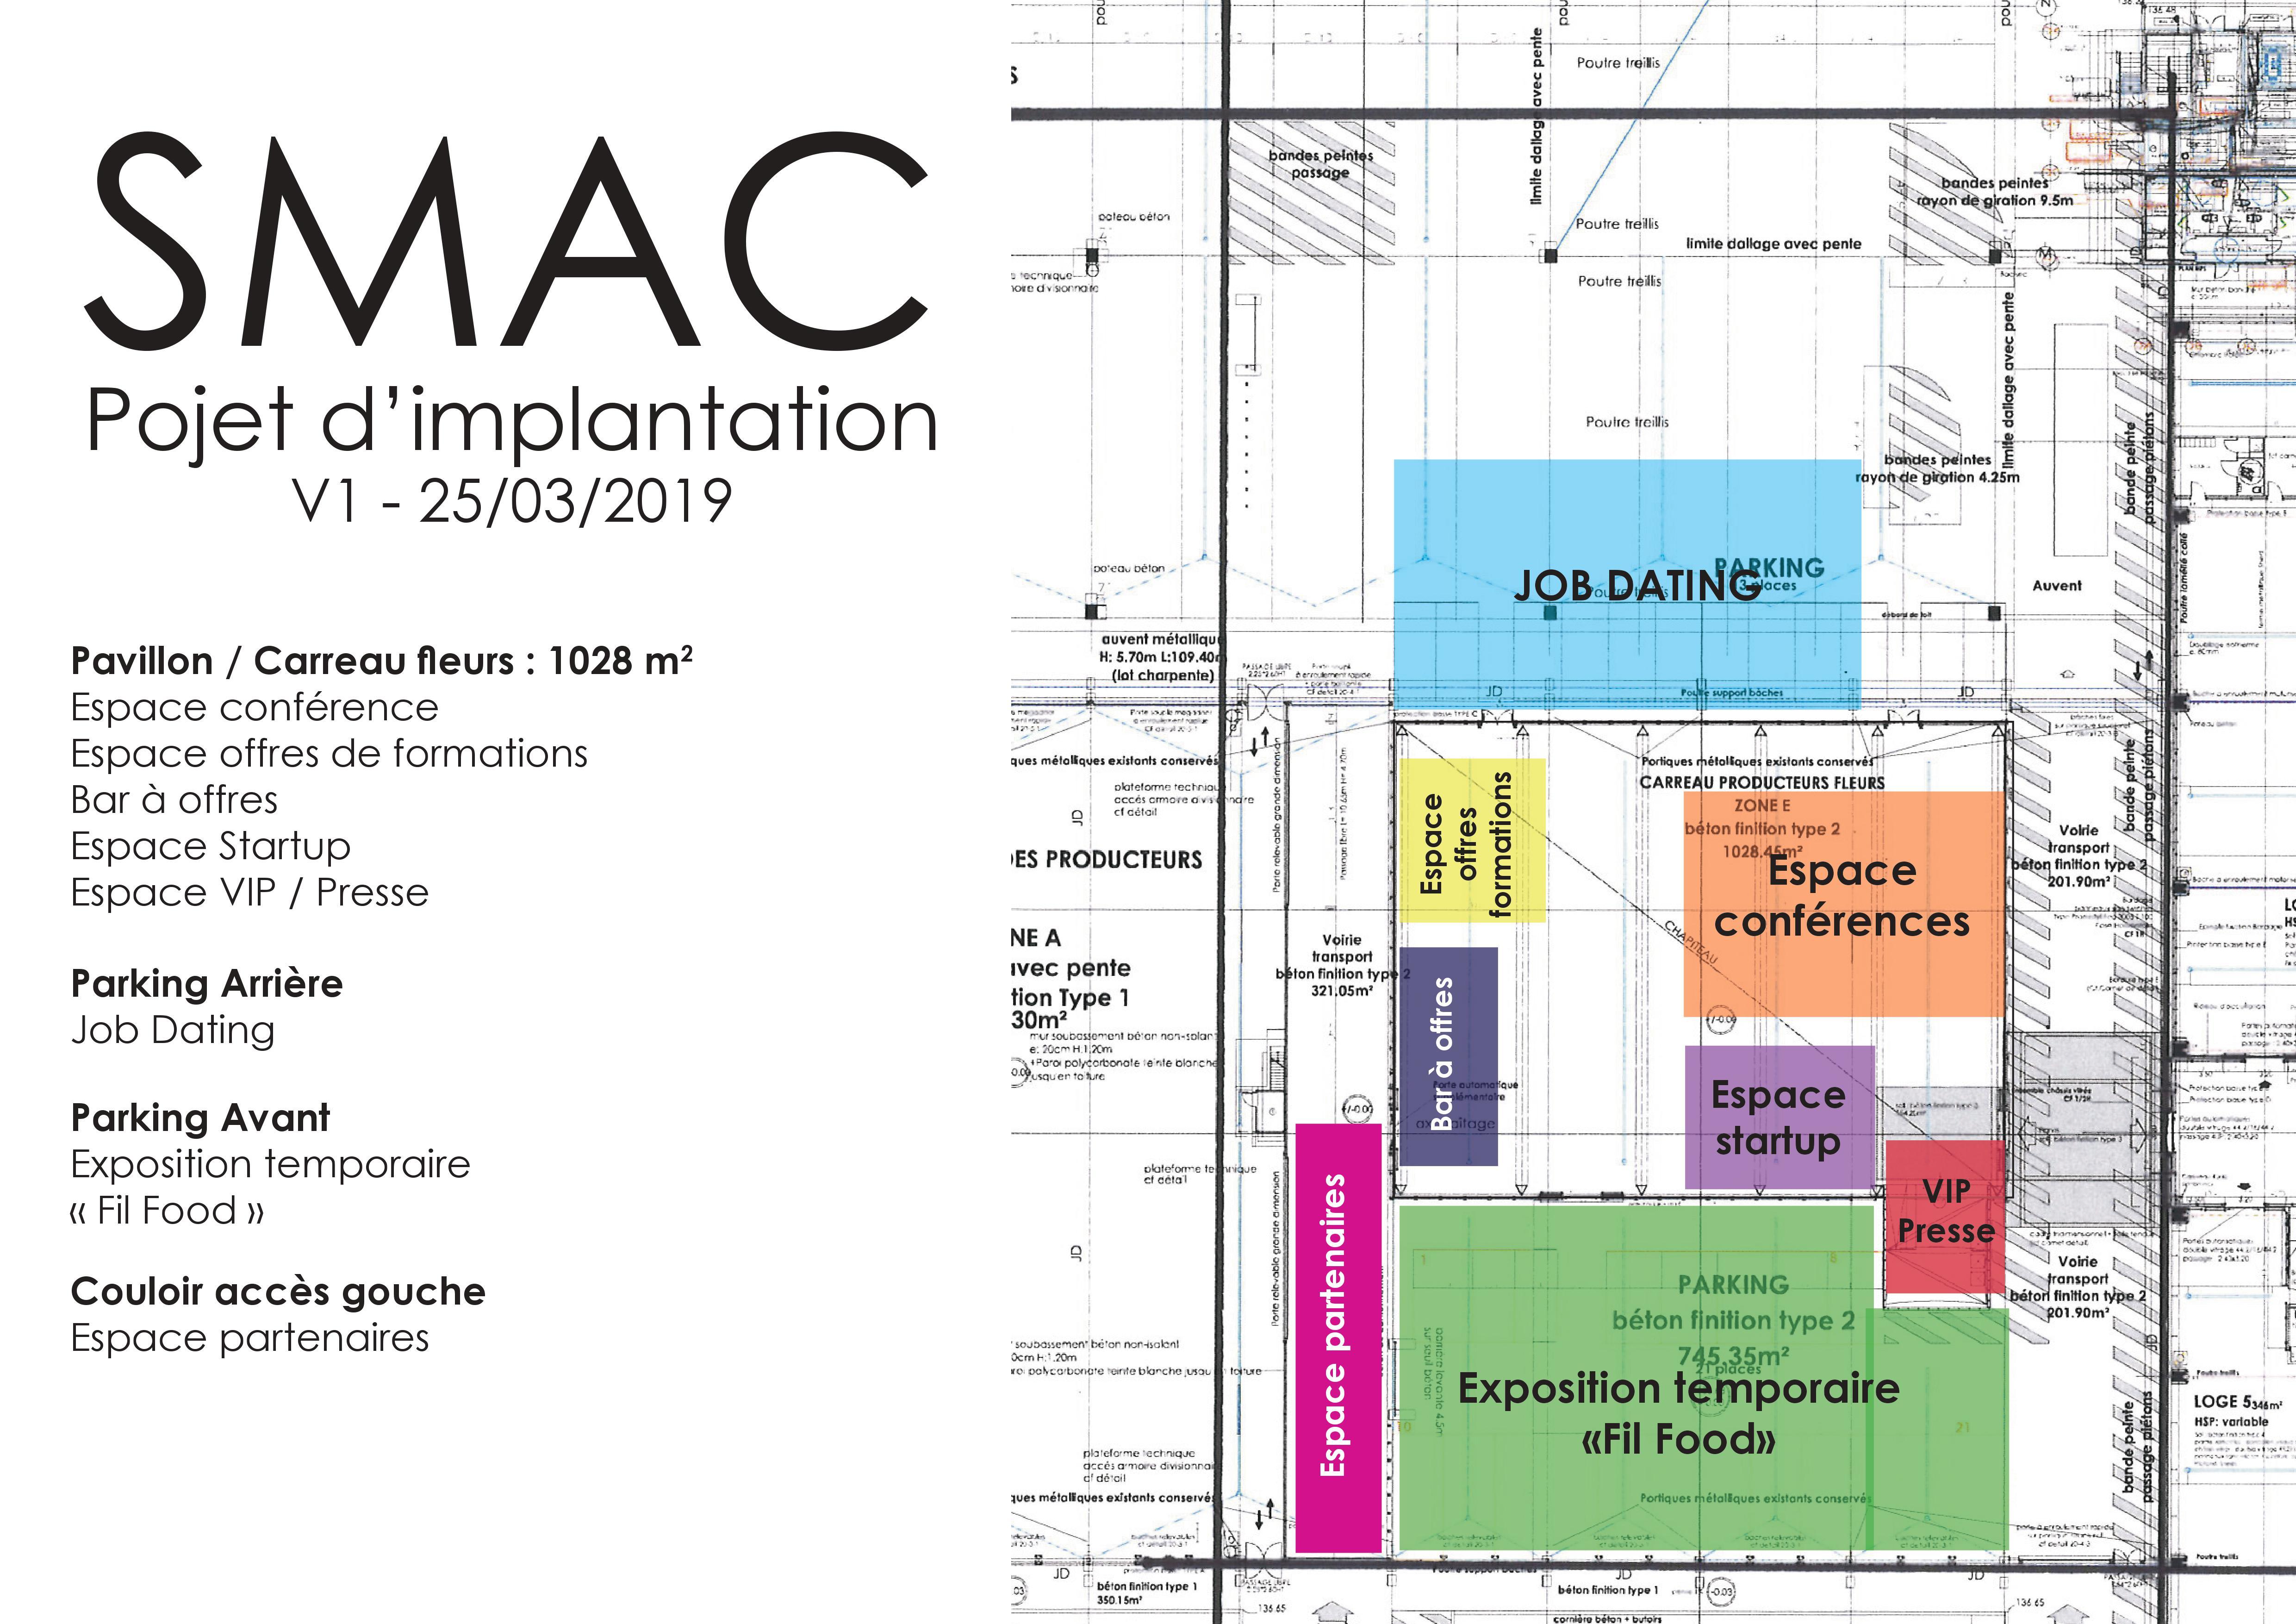 Implantation du salon SMAC